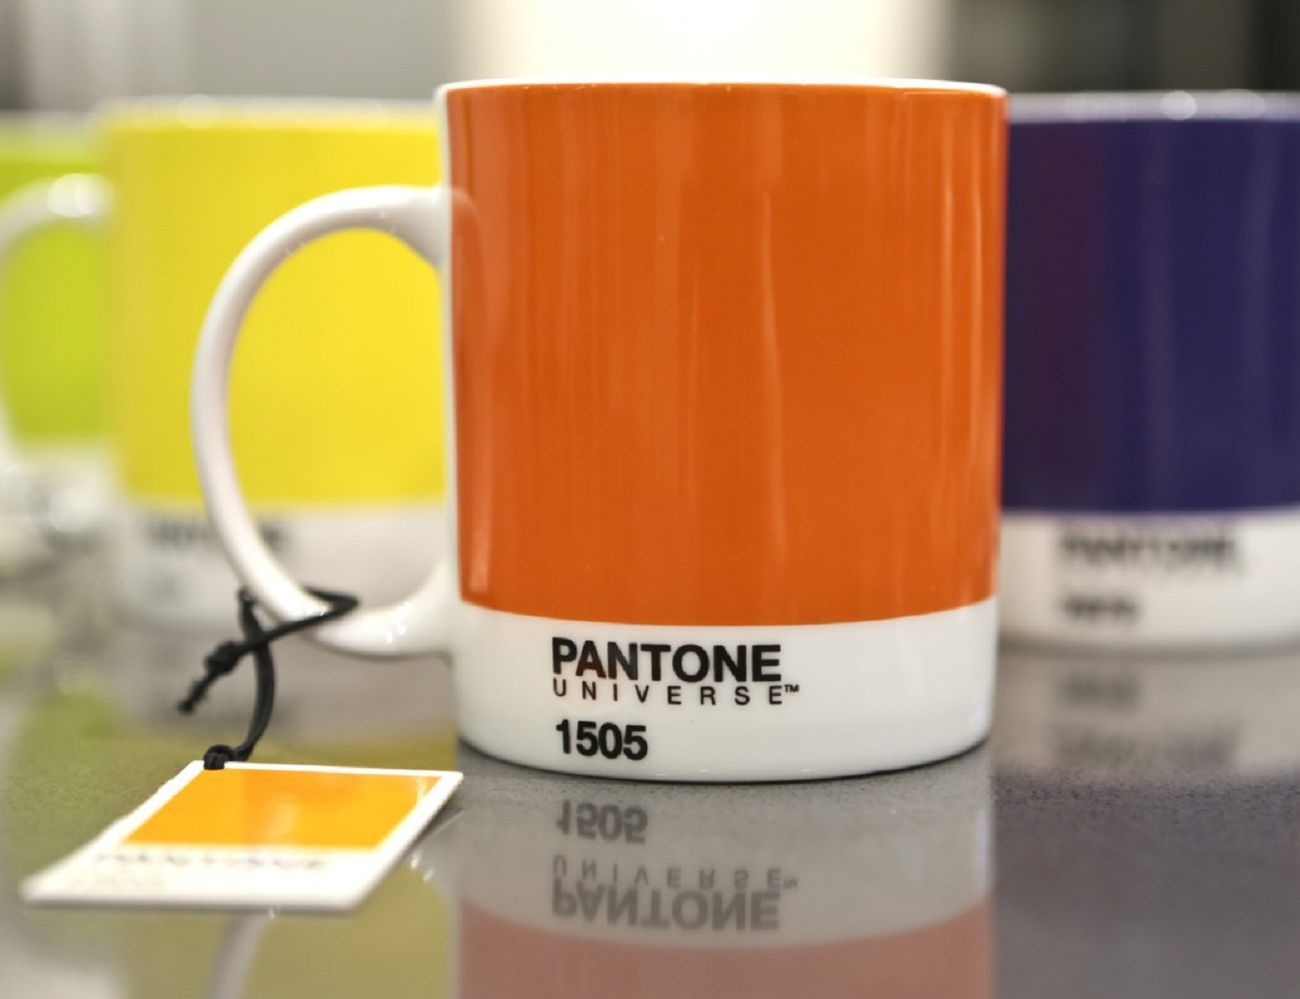 Pantone Universe Mugs